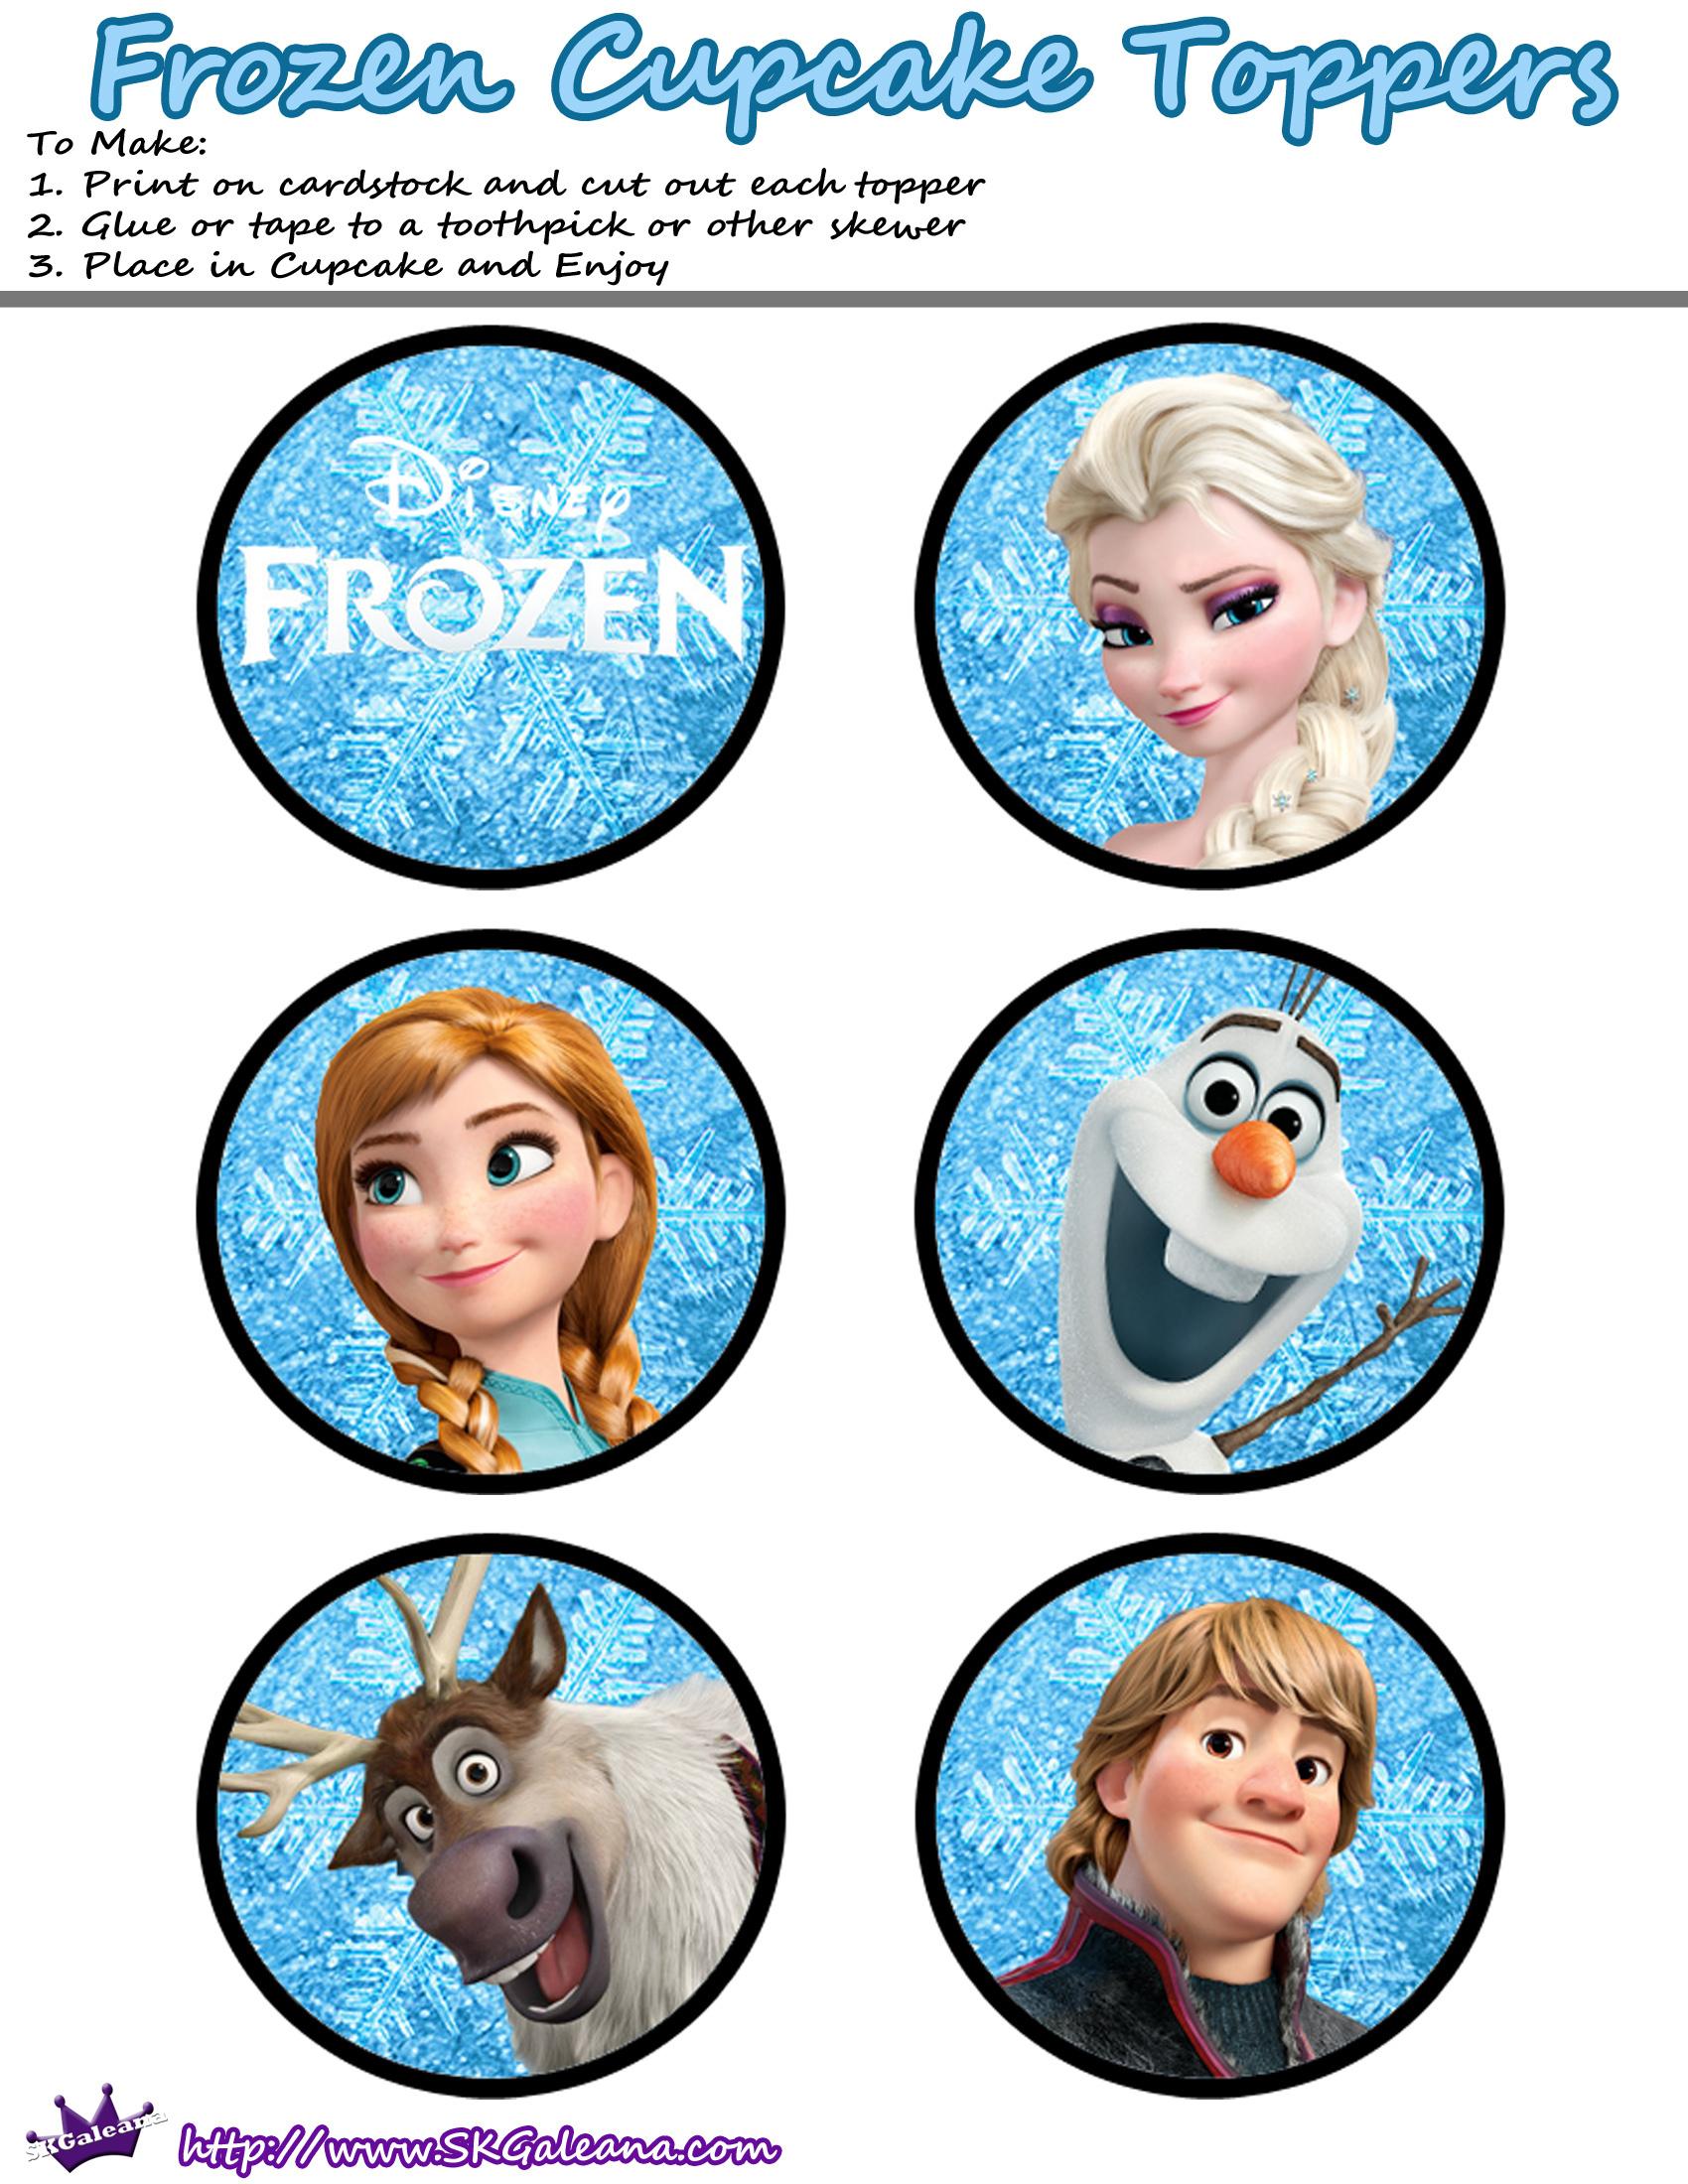 Http Skgaleana Com Free Printables For The Disney Movie Frozen Frozen Birthday Party Frozen Cupcakes Frozen Cake Topper